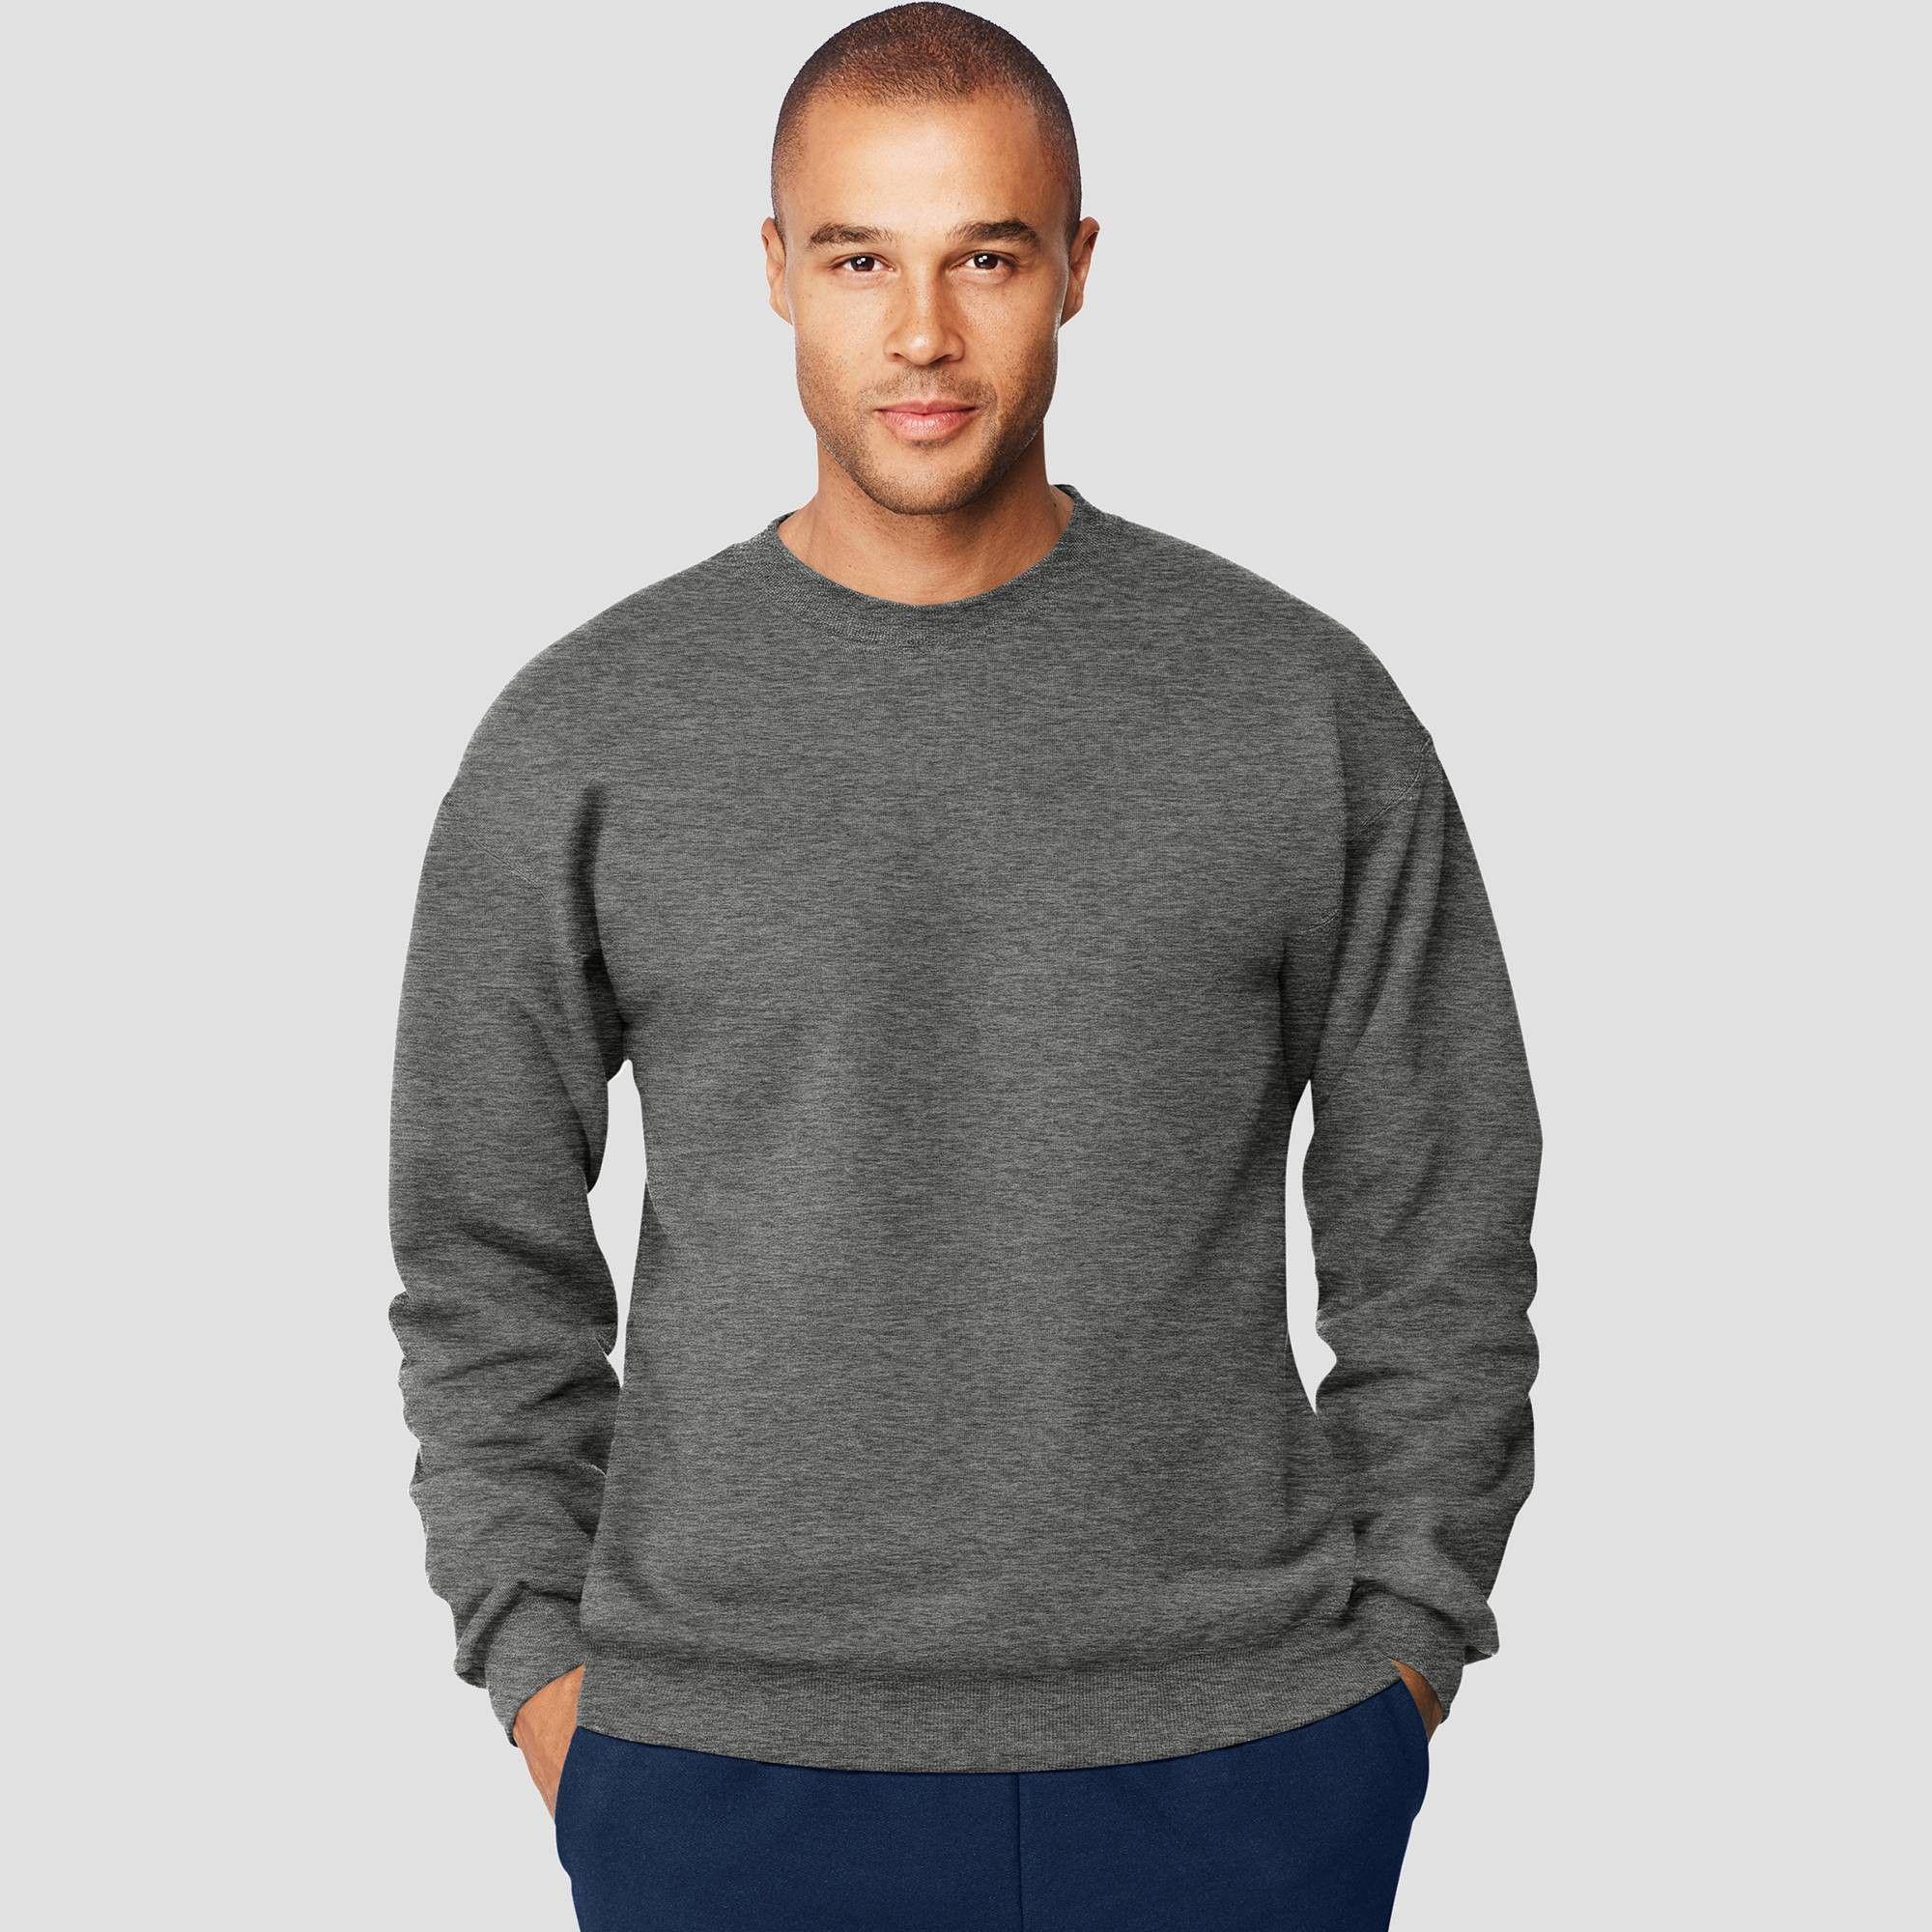 Hanes Men's Big & Tall Ultimate Cotton Sweatshirt Charcoal